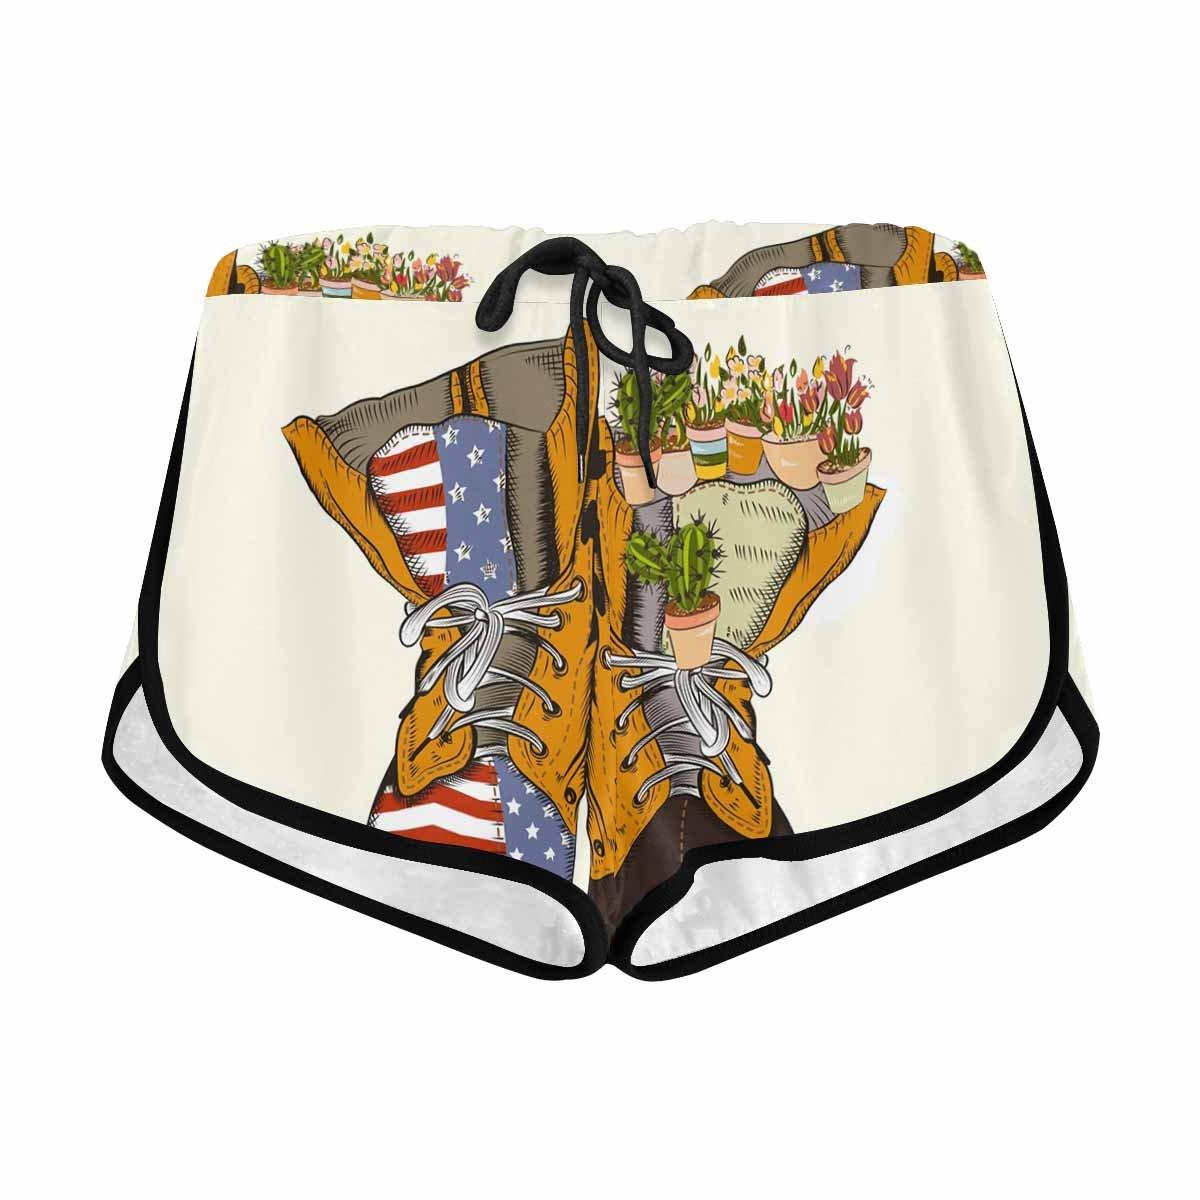 InterestPrint Women Military Boots Elastic Waist Casual Beach Shorts with Drawstring XL